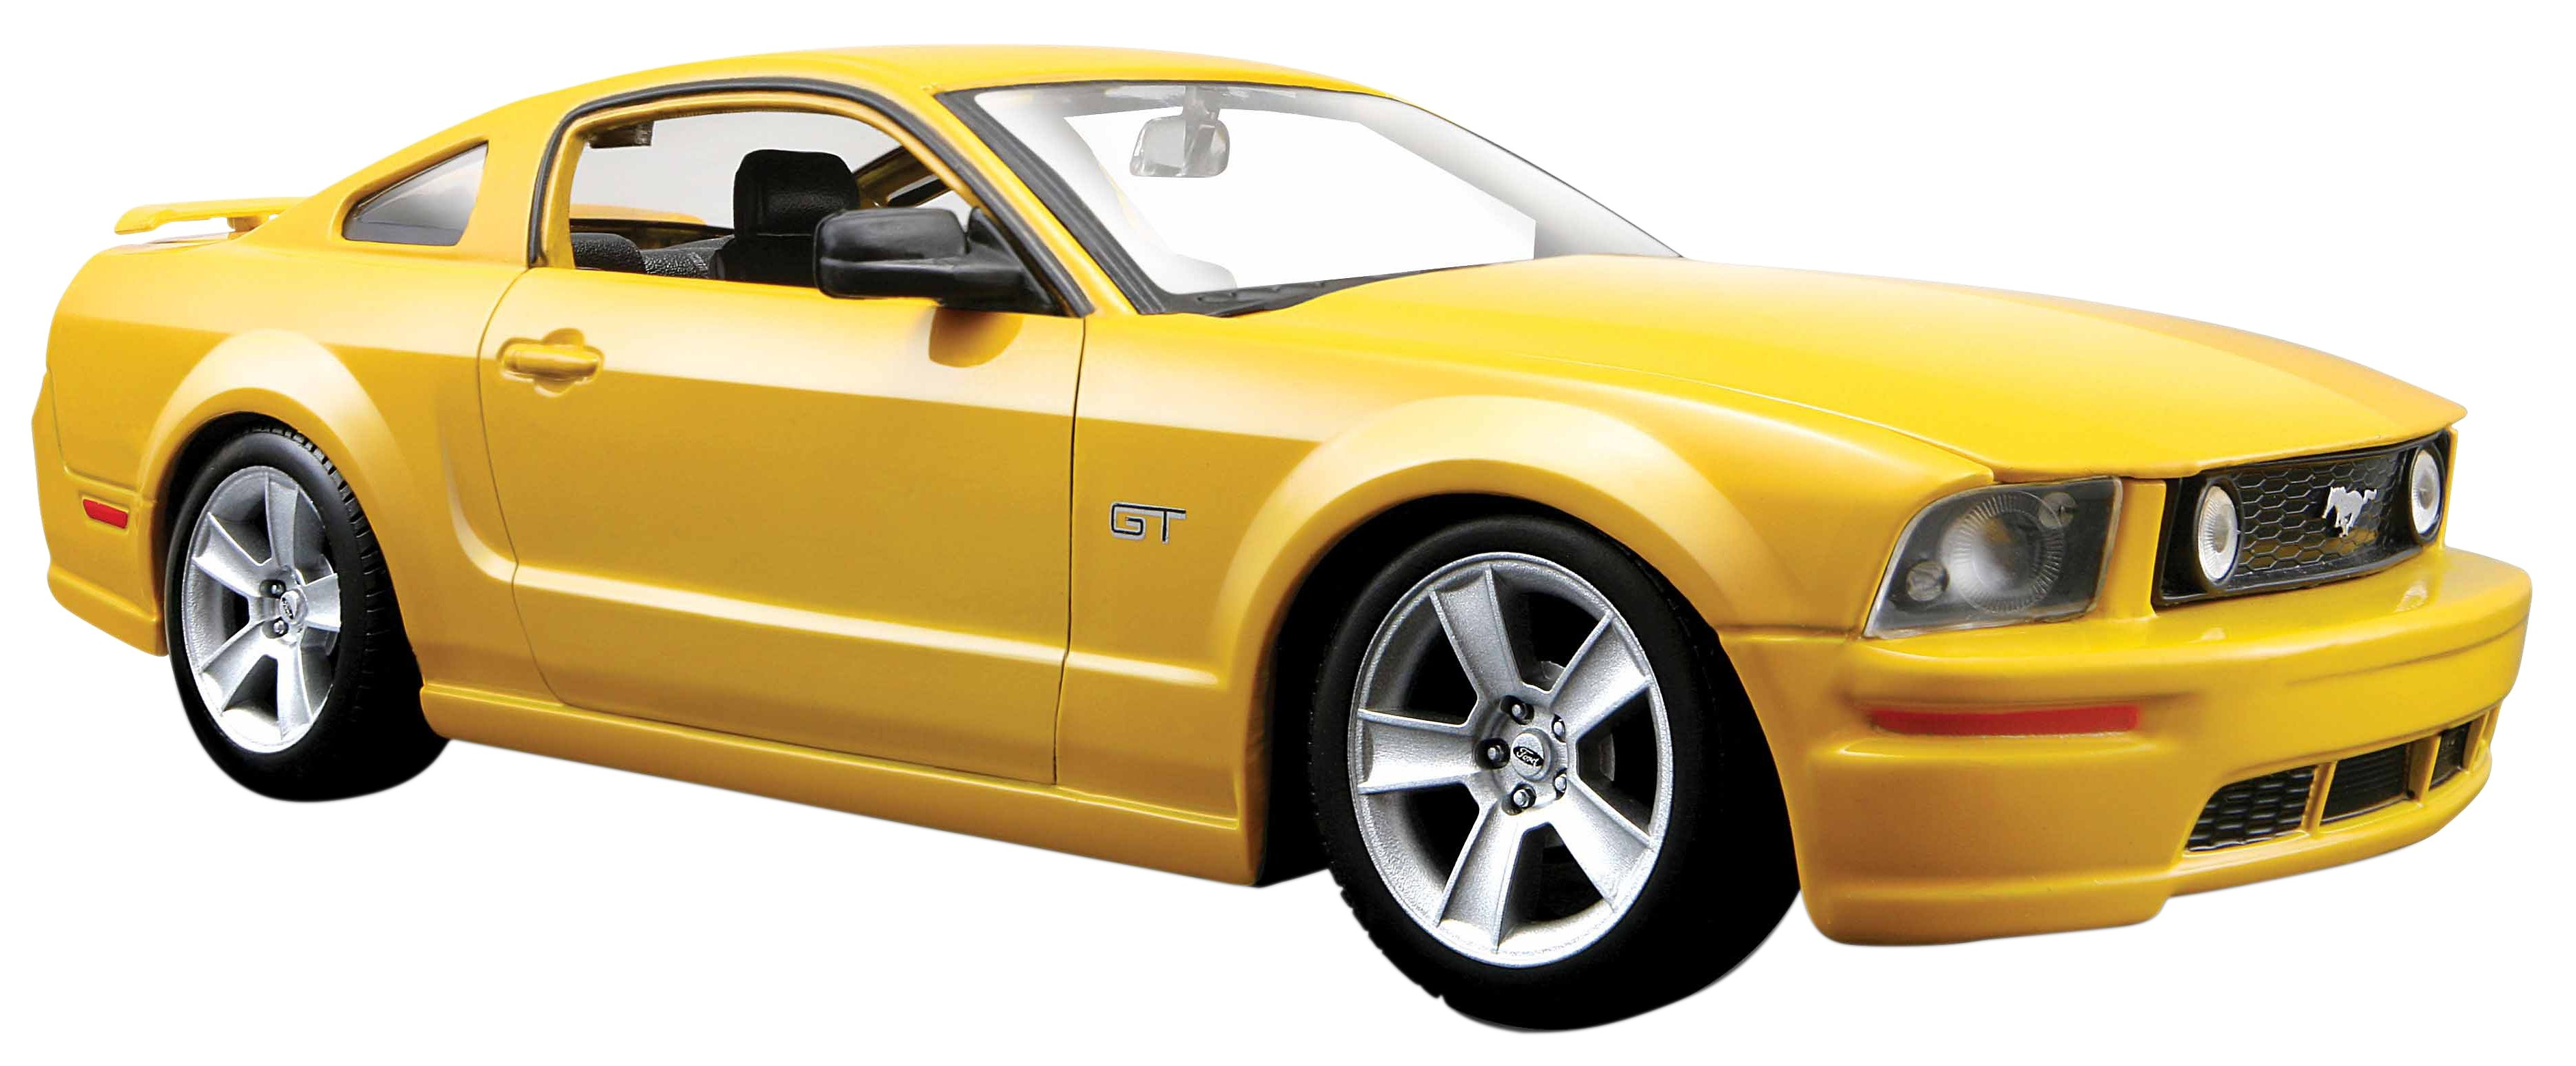 Maisto® Sammlerauto, 1:24, »Ford Mustang GT Coupe«